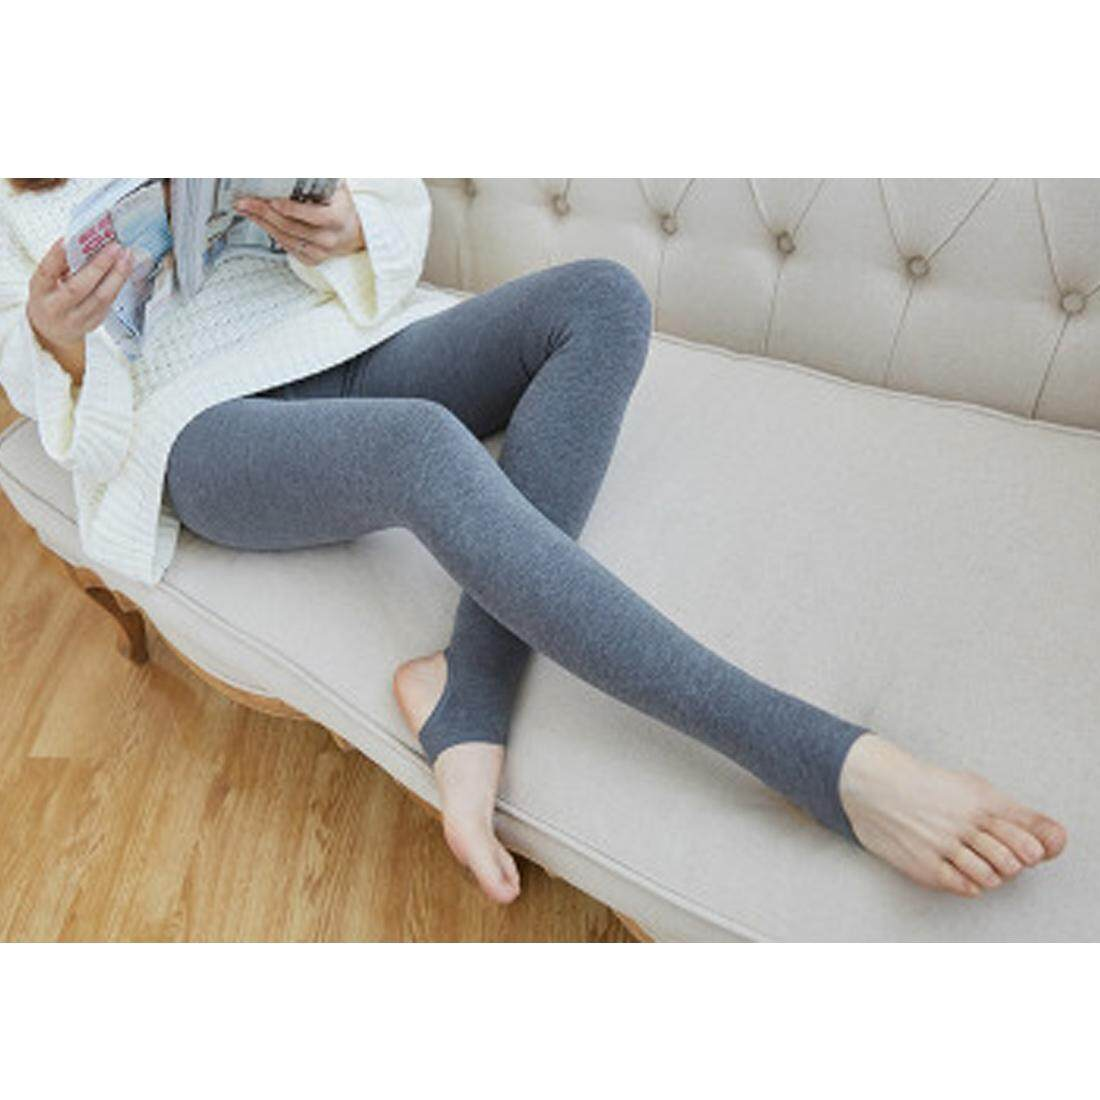 Tinggi Wanita Musim Dingin Hangat Pinggang Bulu Lined Legging Pelangsing Kaki Stirrup Celana Ketat-Internasional